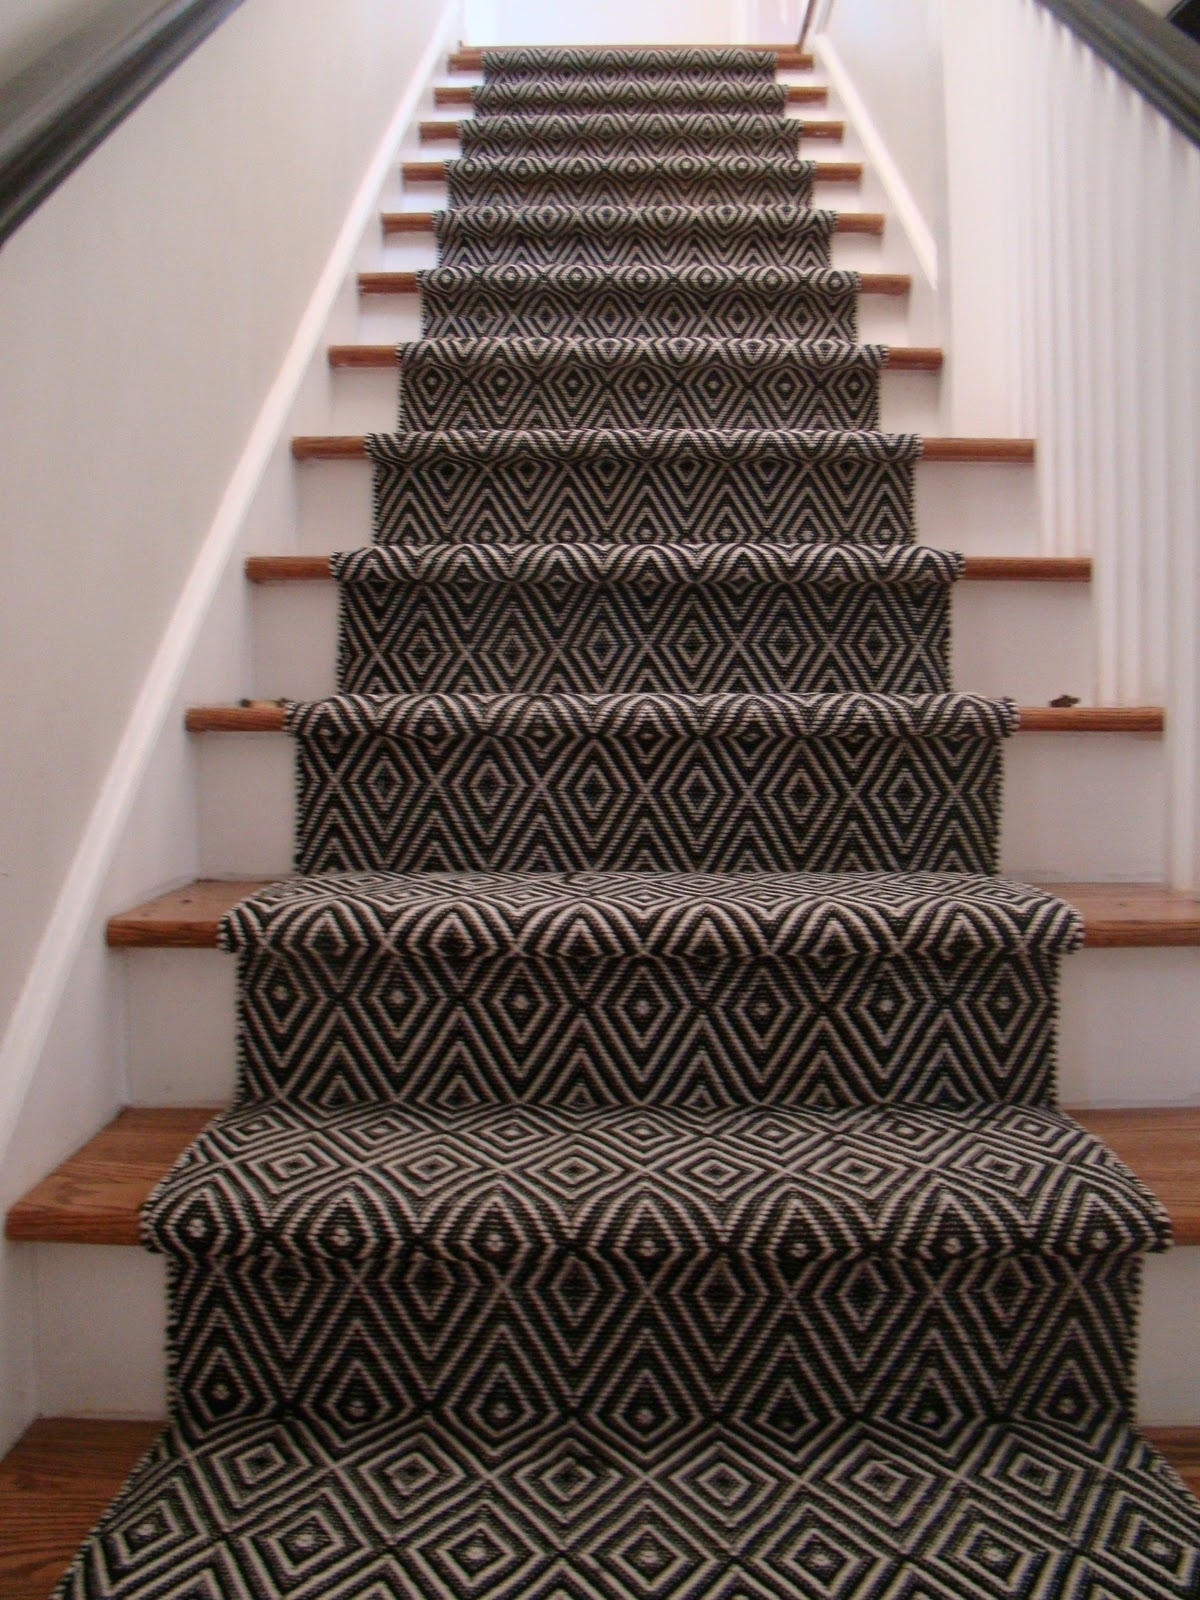 Albert And Dash Ideas On Foter   Zebra Print Stair Carpet   Staircase Remodel   Ideas   Stair Treads   Leopard Print   Carpet Runner